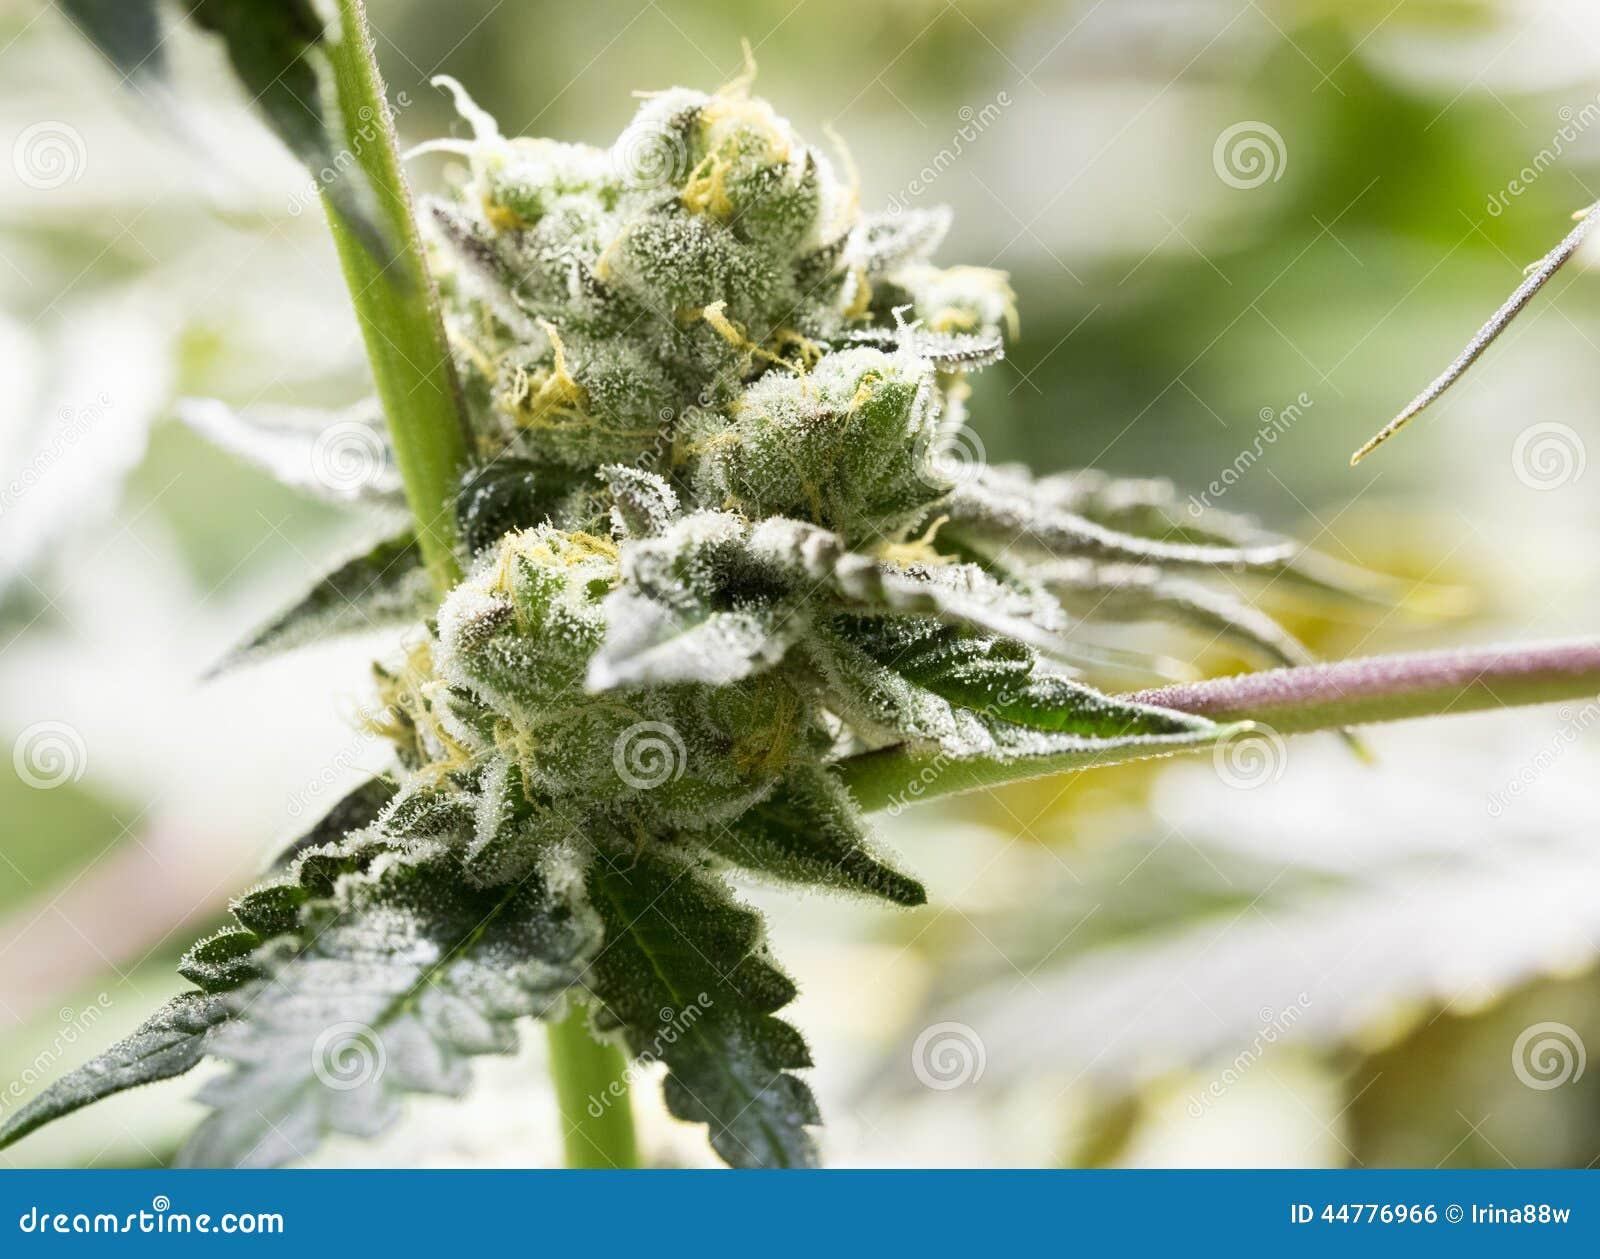 Marijuana flower buds.